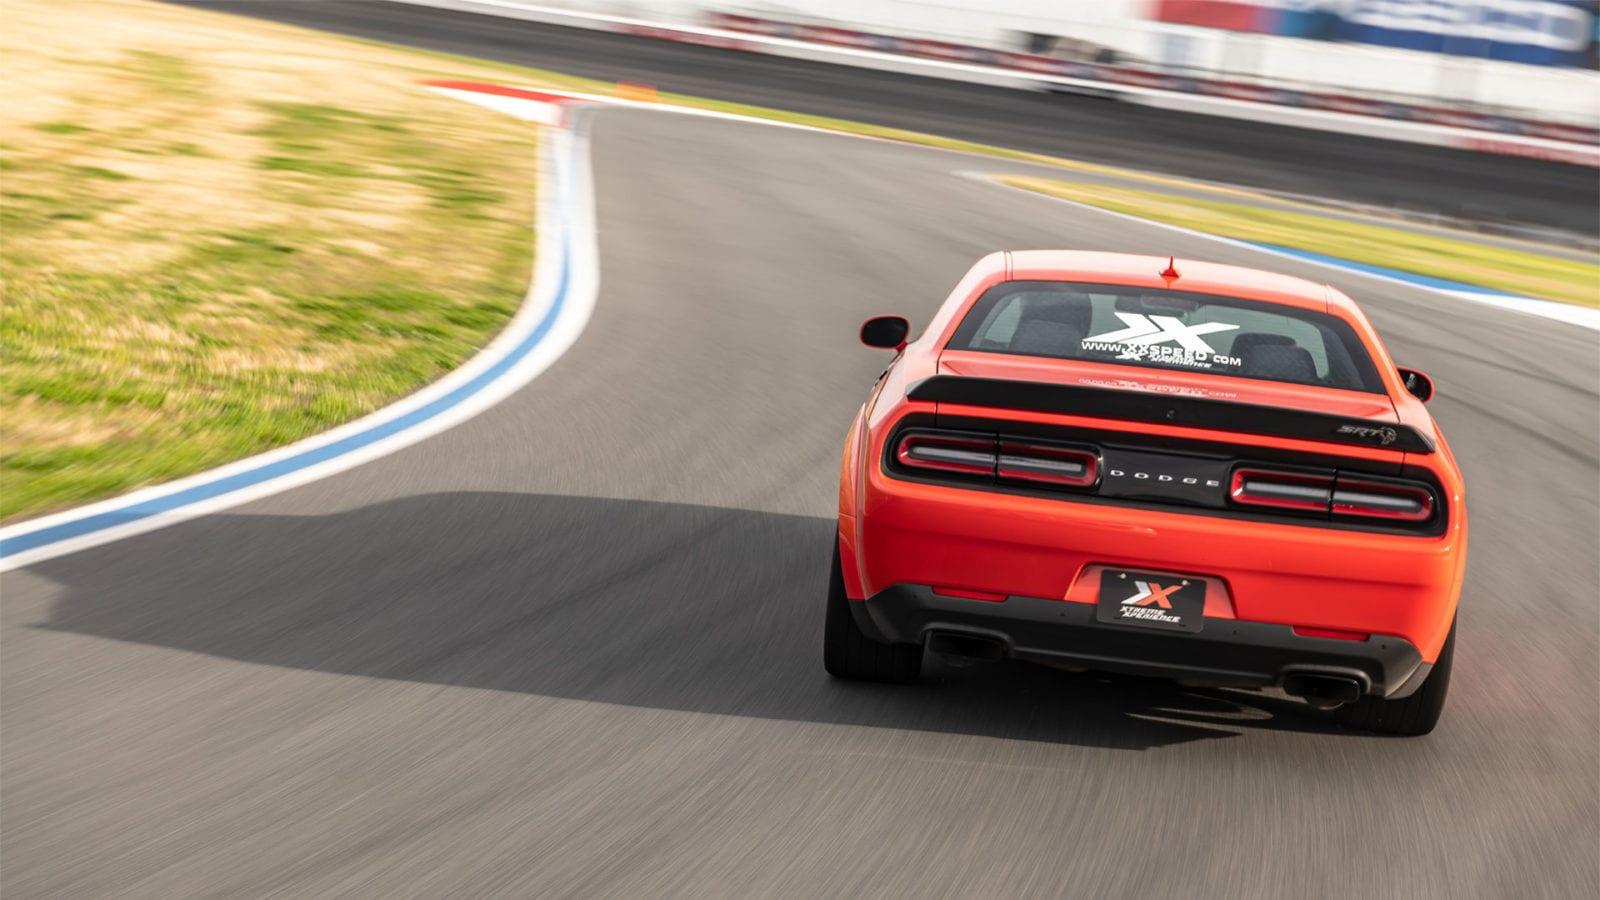 Dodge Hellcat Widebody rear end